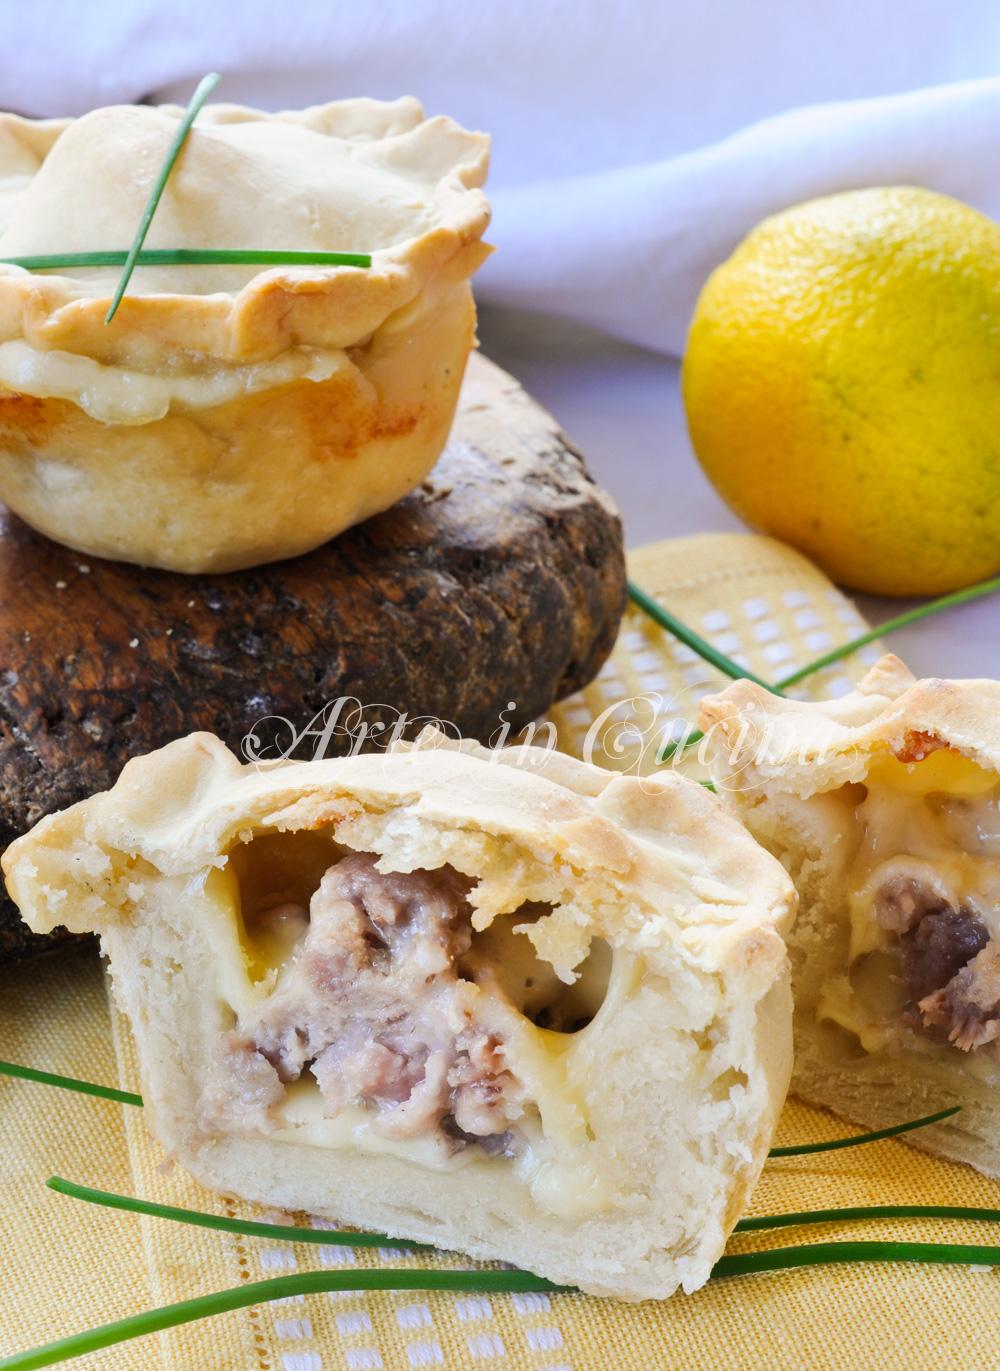 Tortine salsiccia e provola finger food veloci vickyart arte in cucina